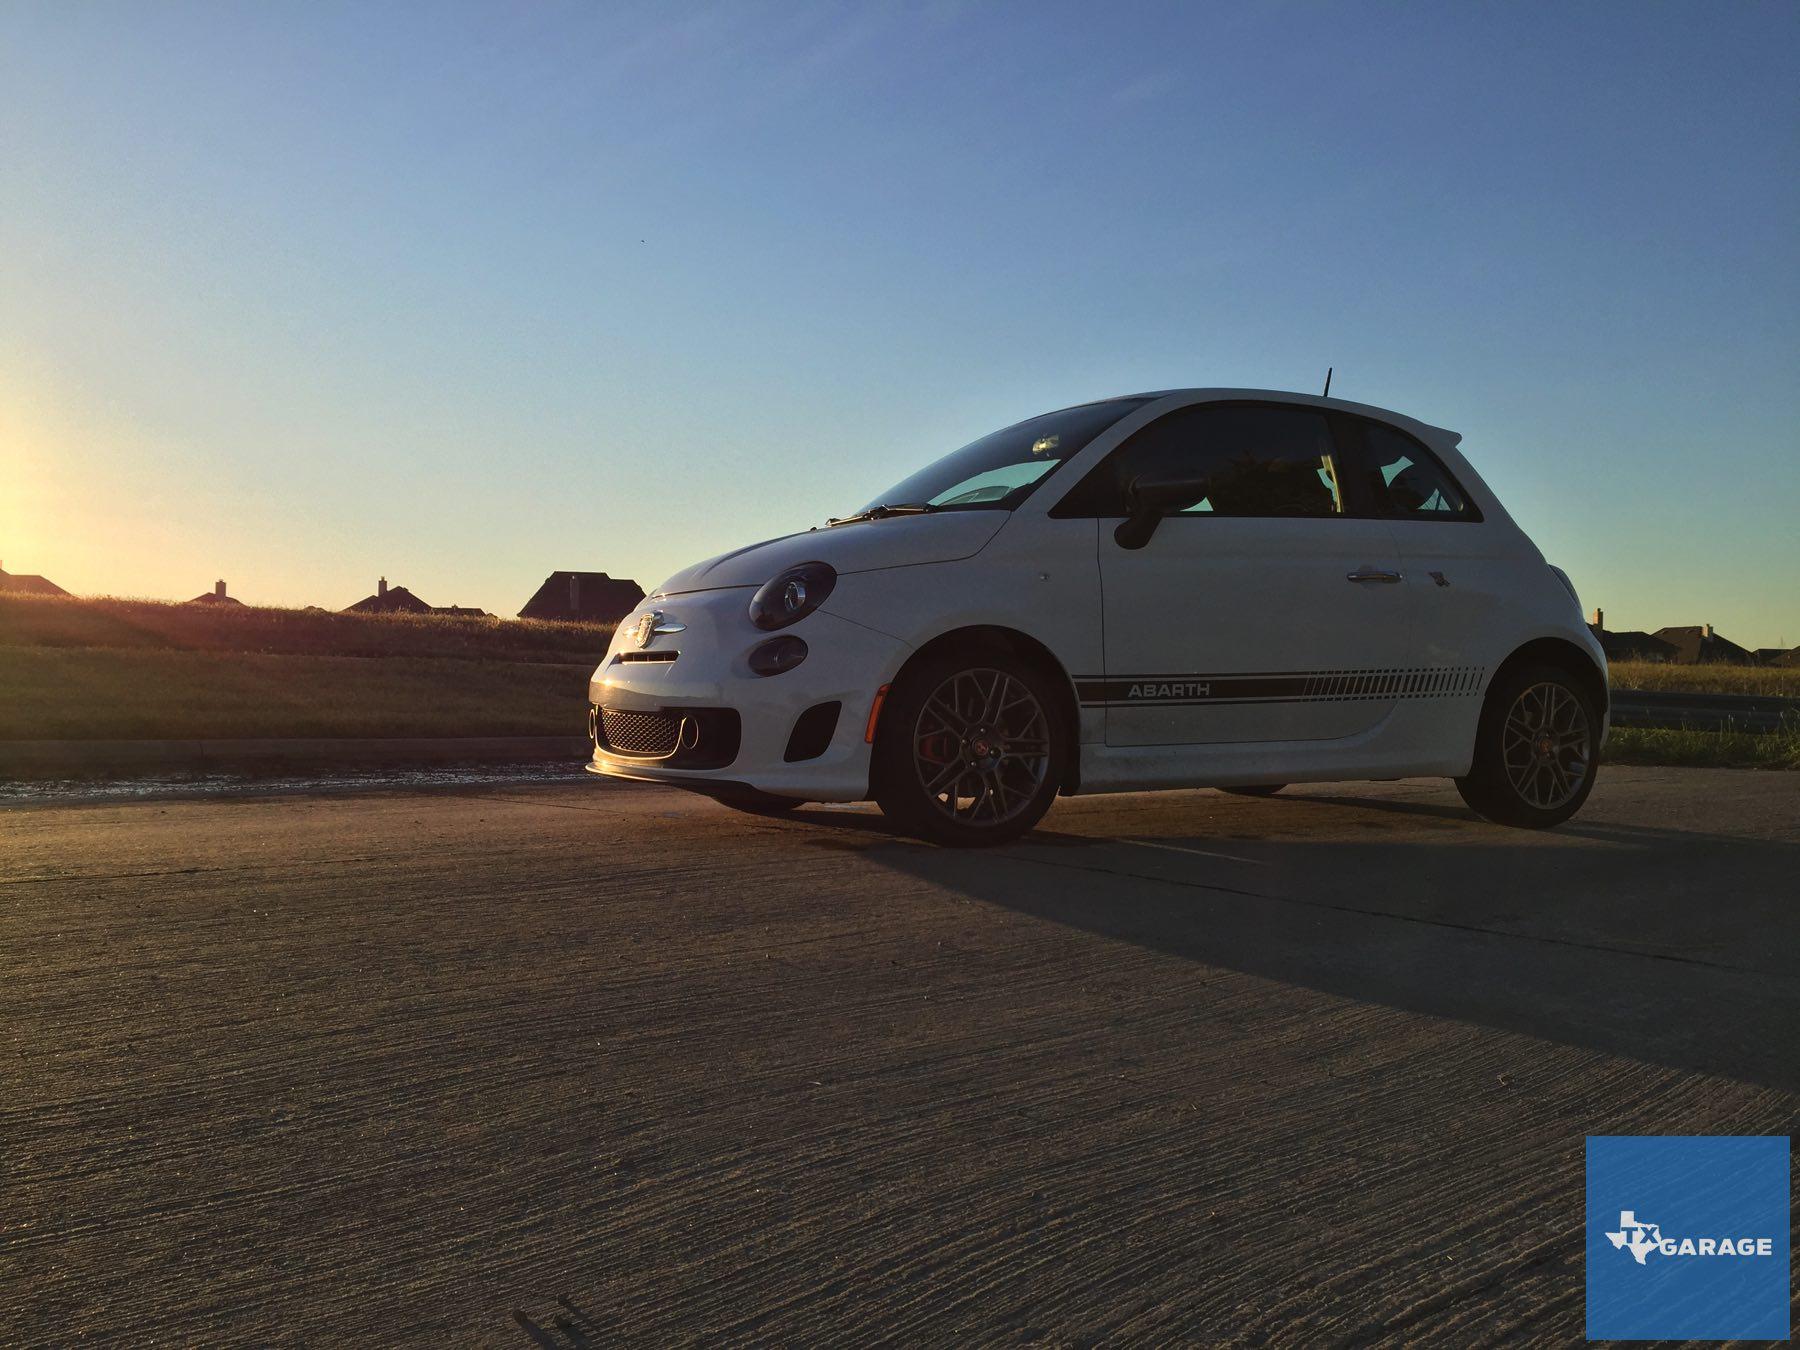 2015-Fiat-500-Abarth-txGarage-020